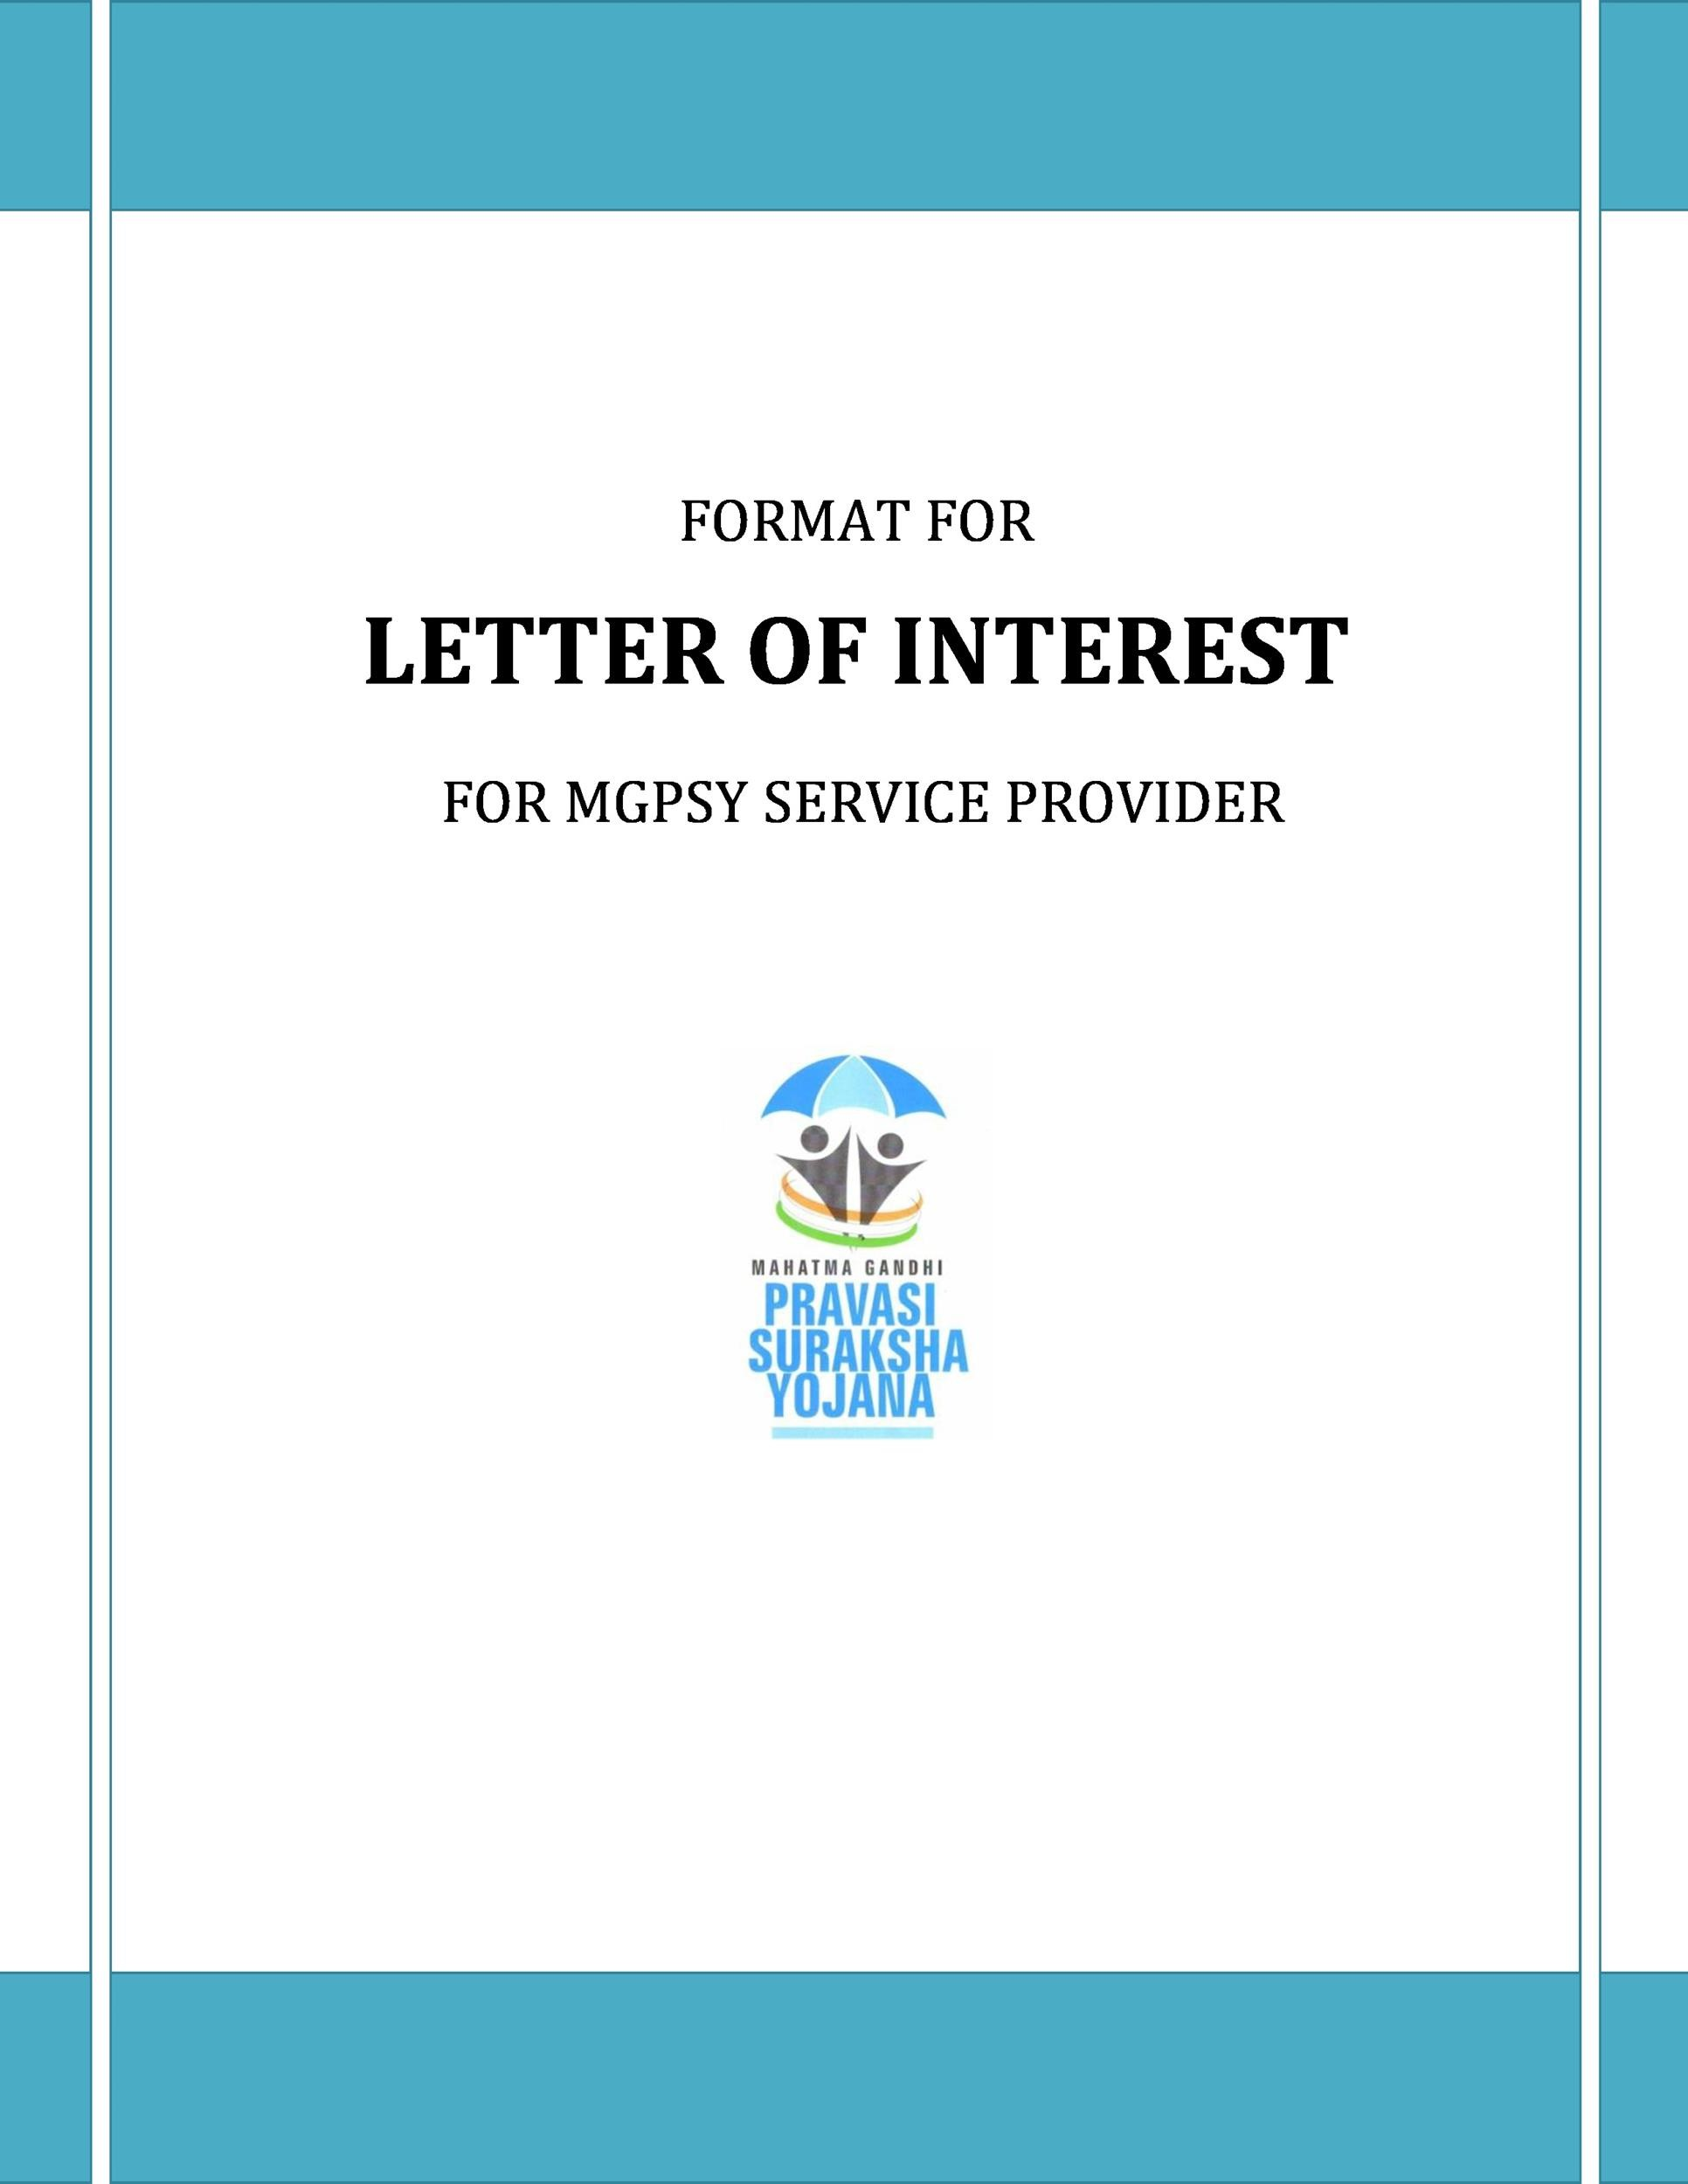 Free letter of interest 19